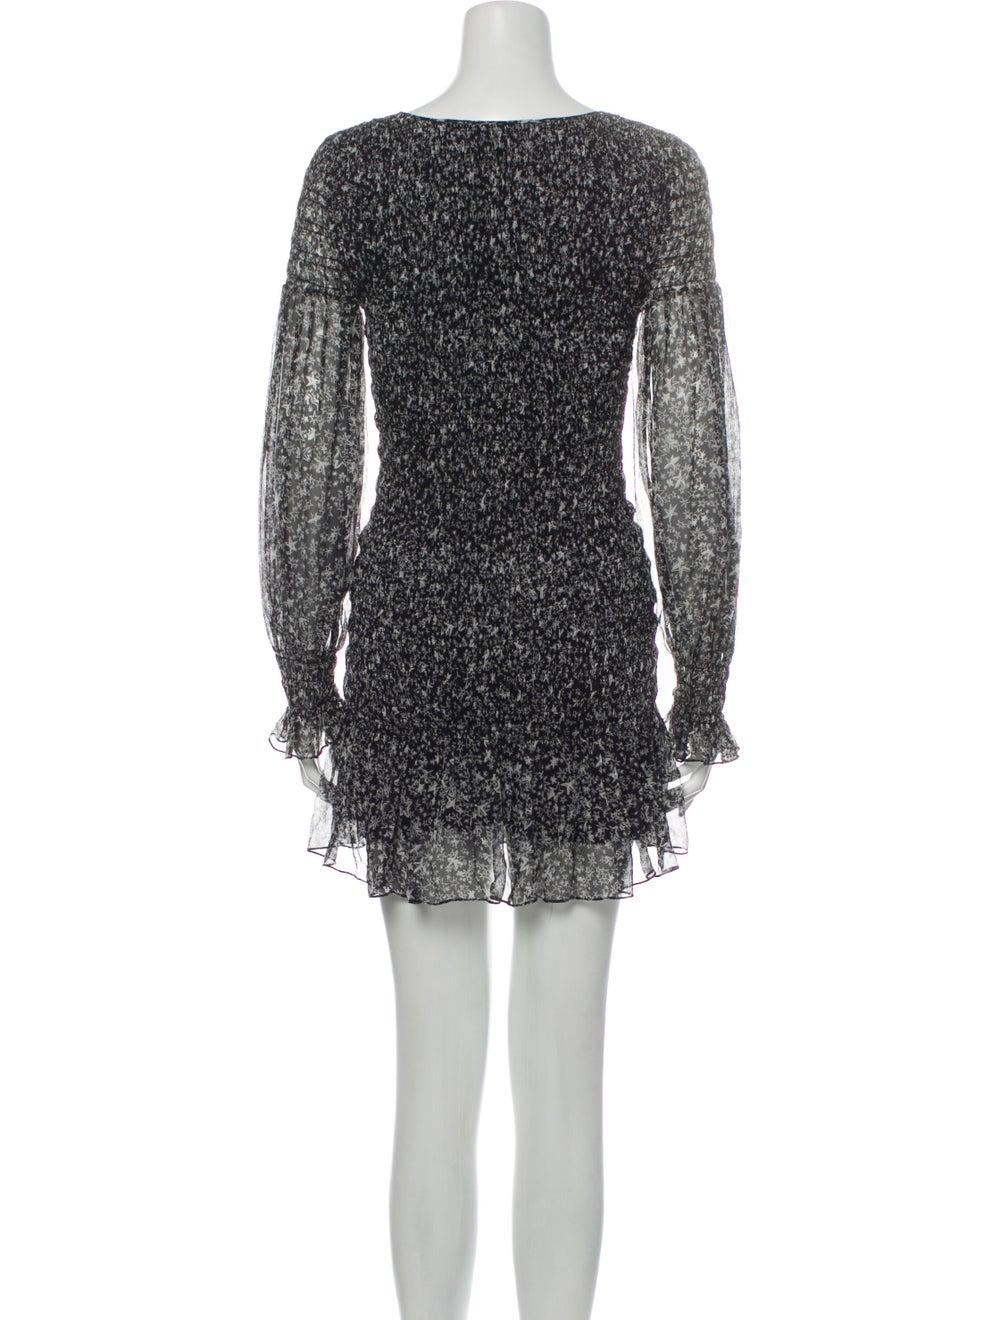 LoveShackFancy Silk Mini Dress Black - image 3